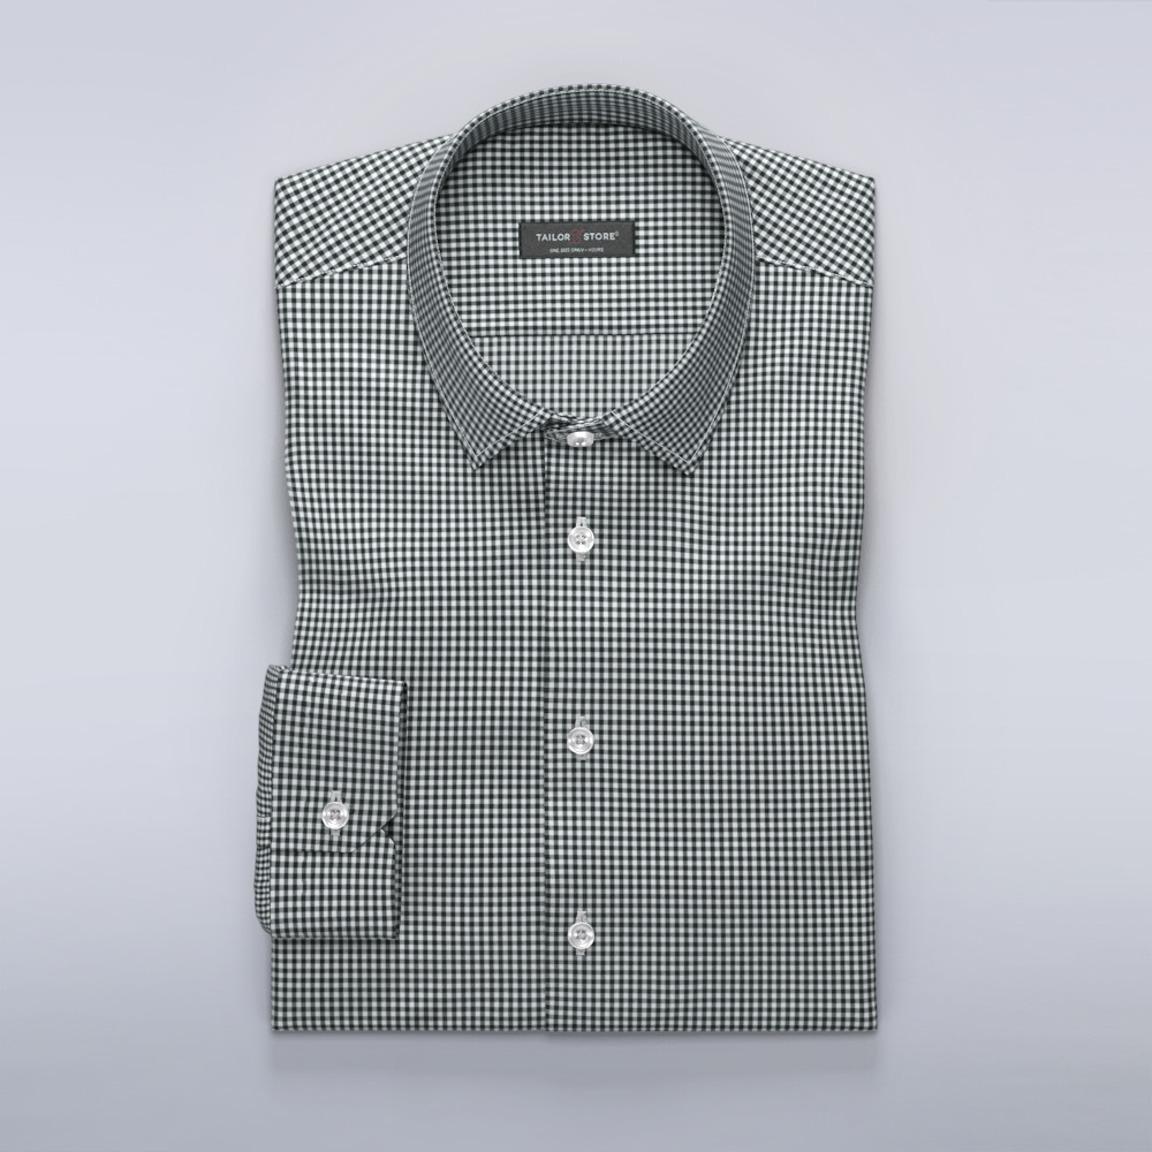 In Store® Overhemd Geruit ZwartwitTailor Geruit wN8nm0